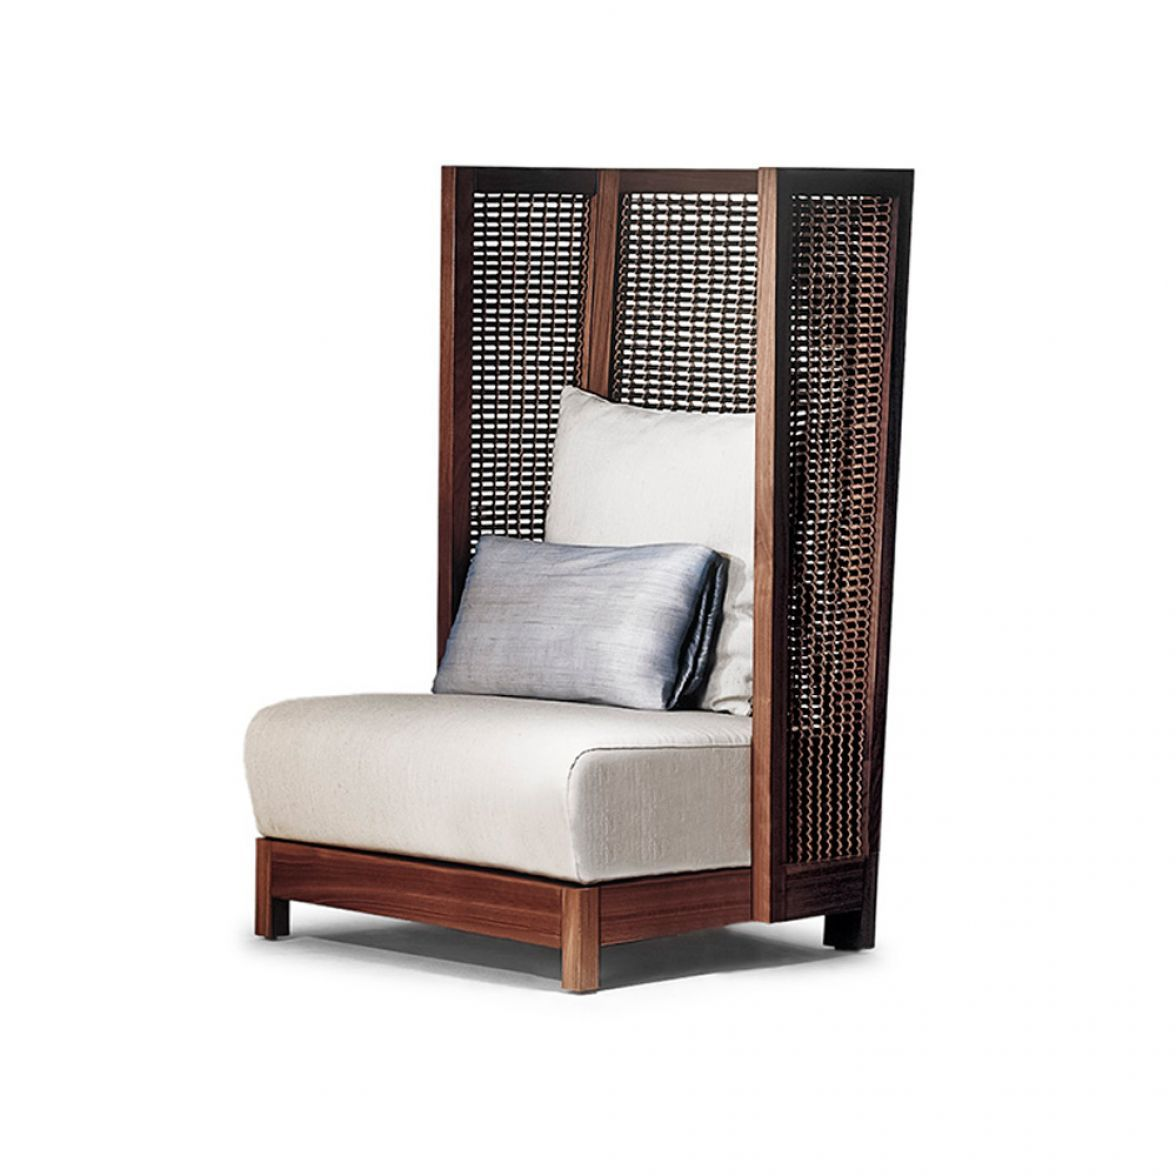 Suzy wong armchair